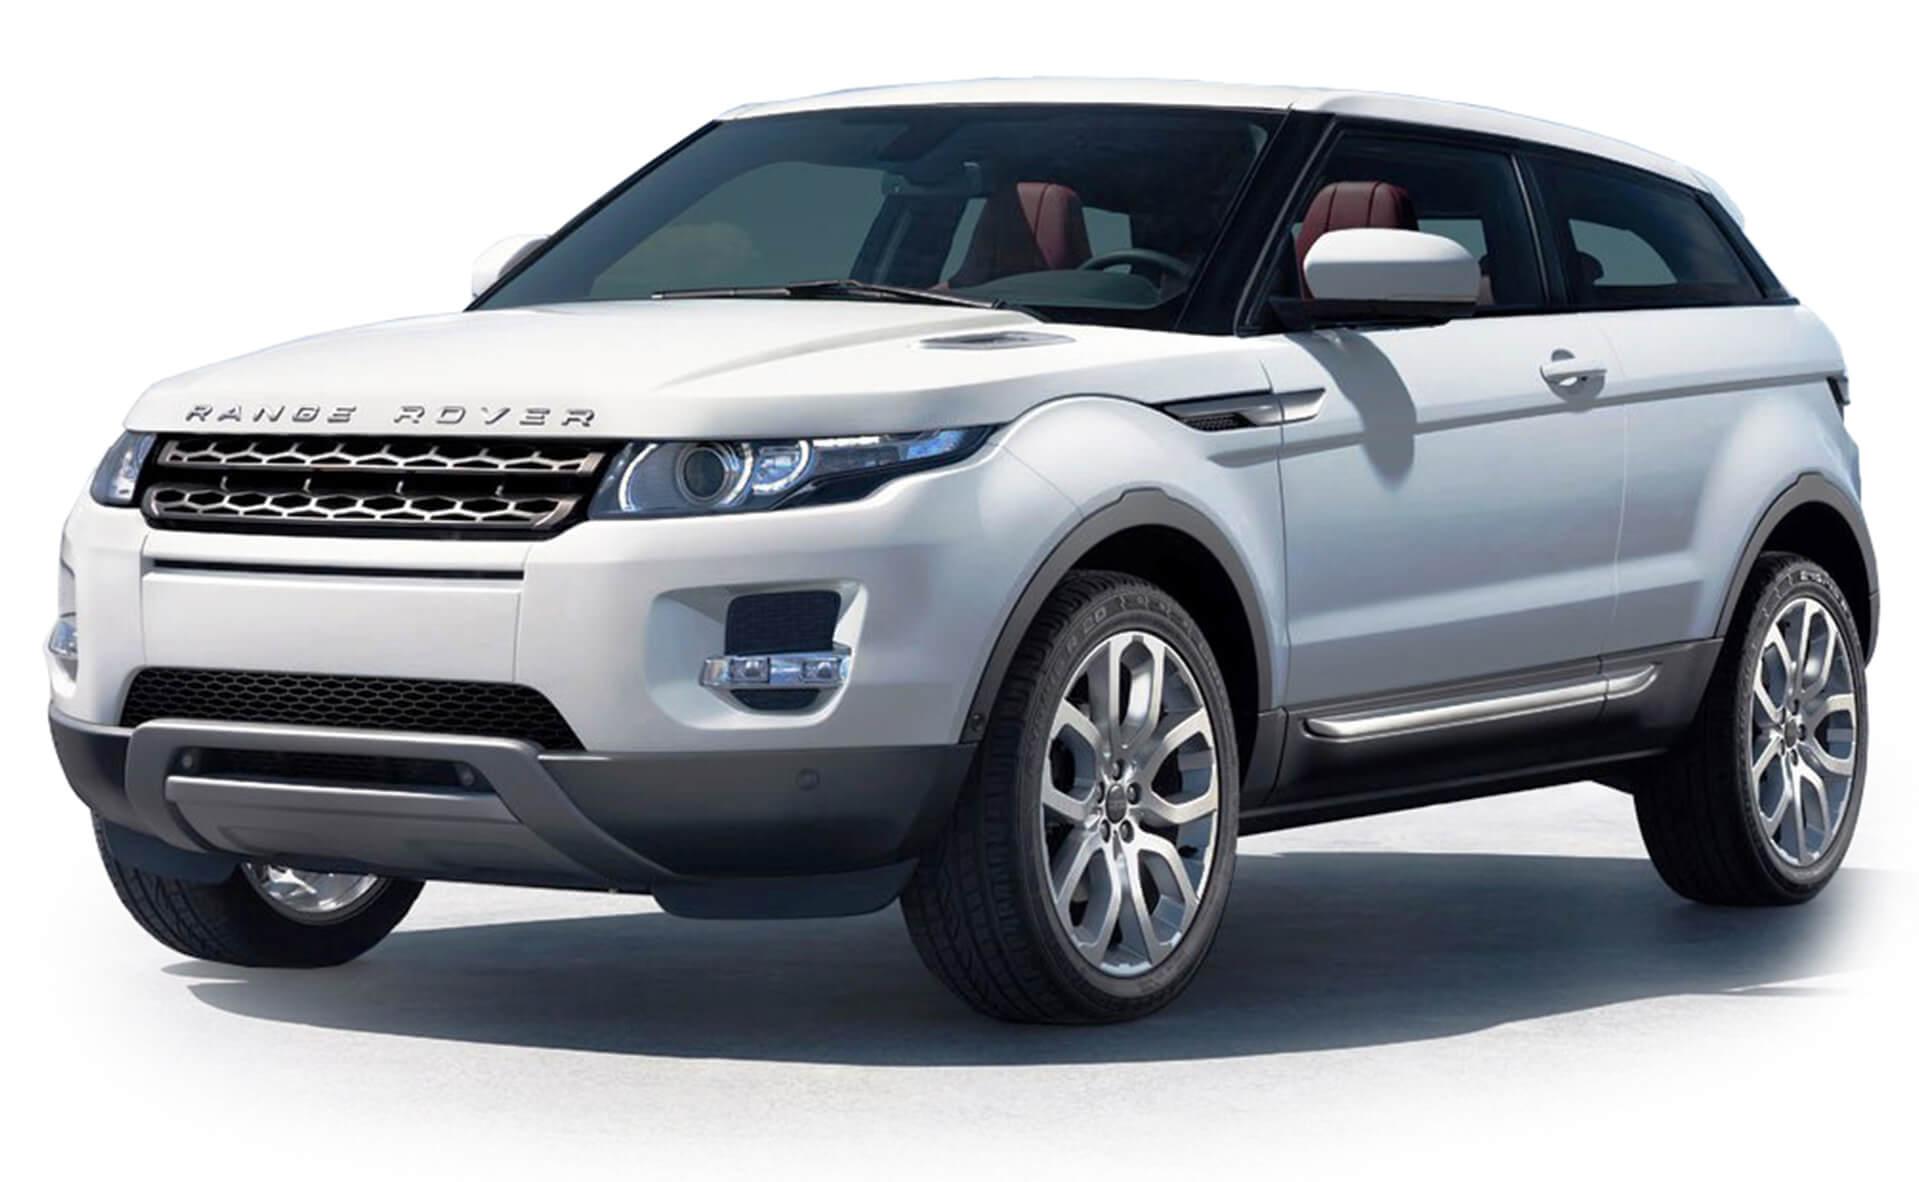 Range-Rover-Evoque_exterior-2